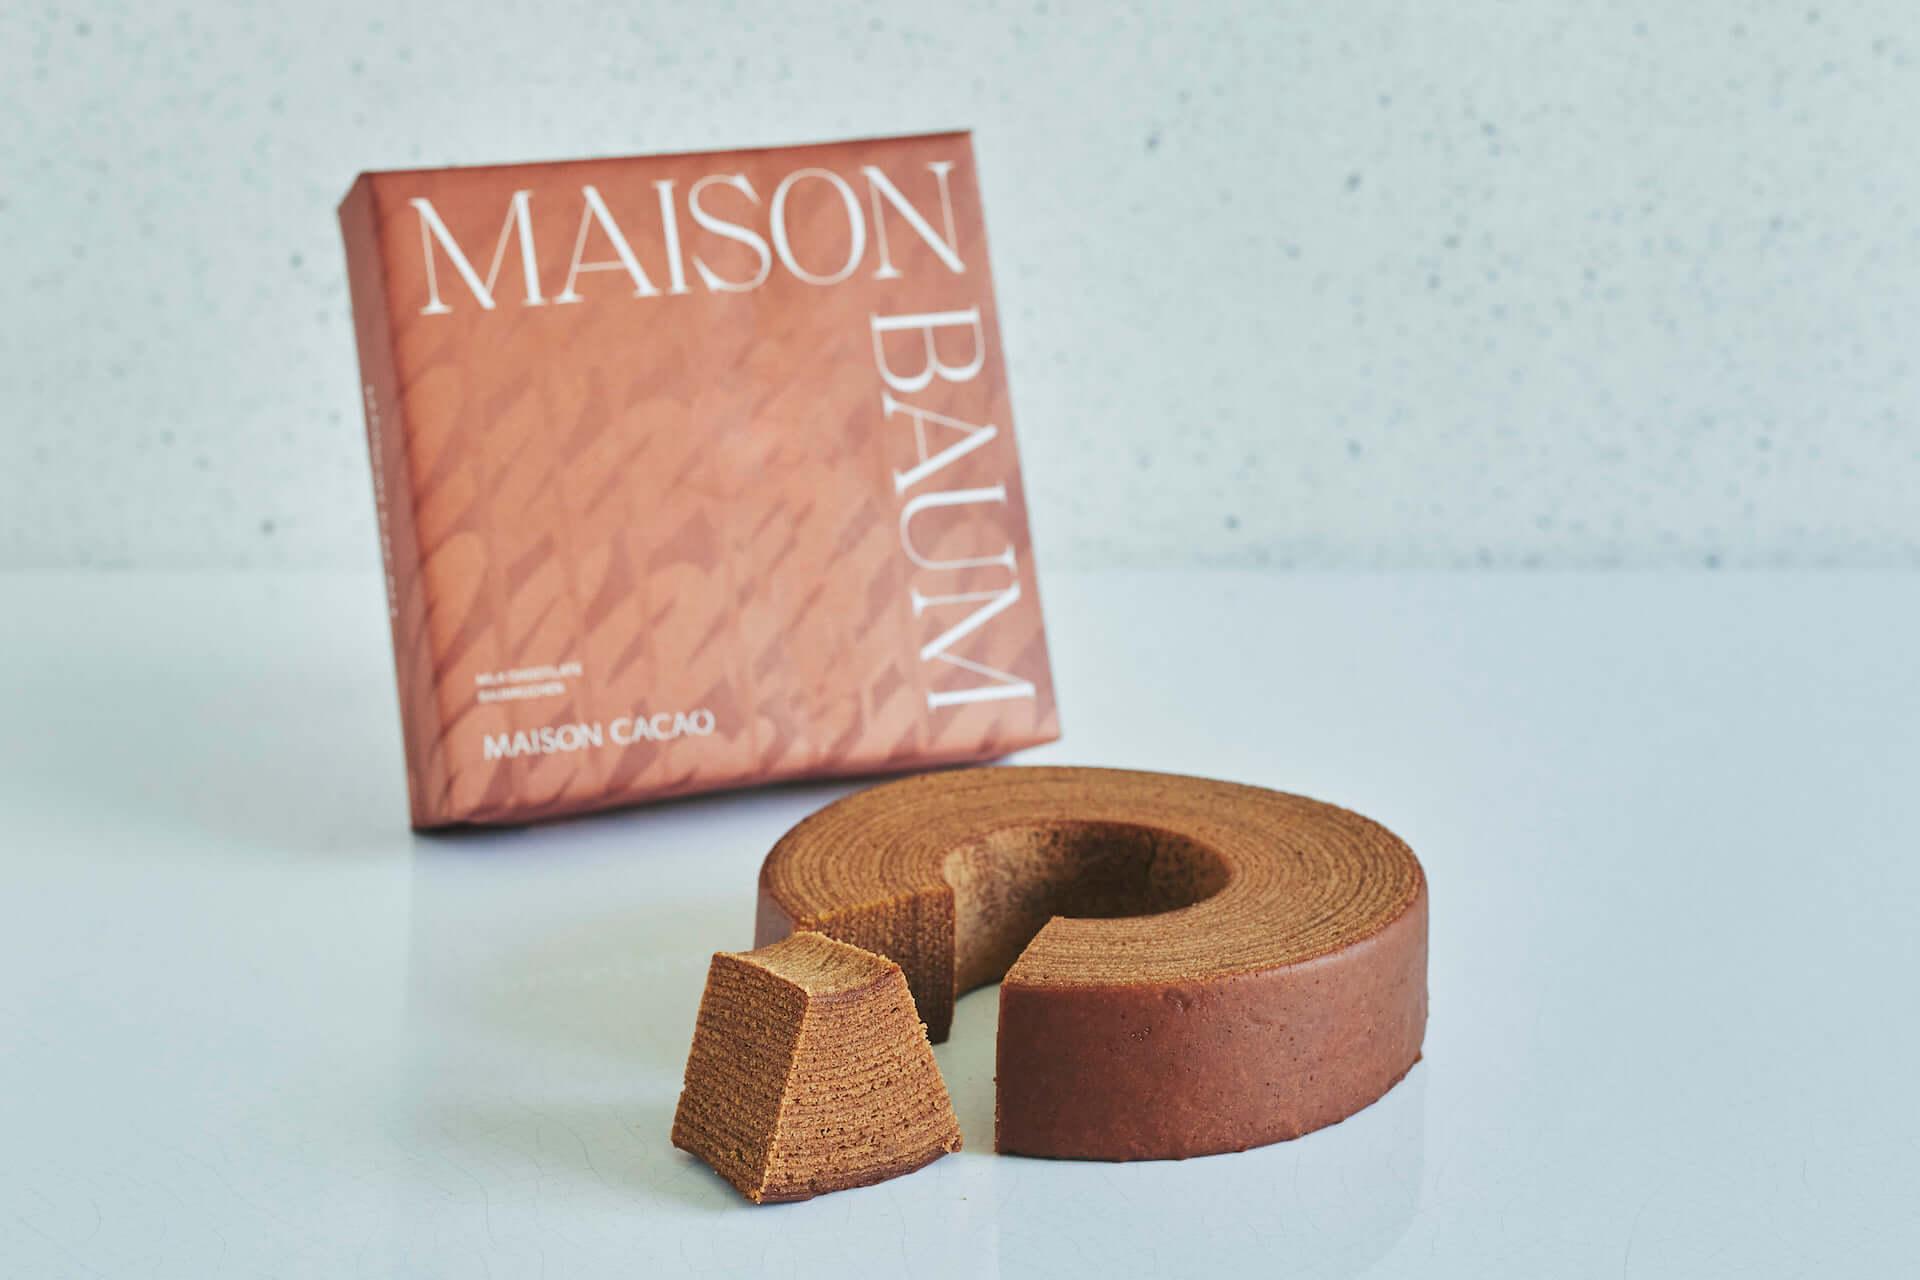 「MAISON CACAO」の期間限定コスメショップが阪急うめだ本店に登場!発酵カカオバターを使用したバーム、保湿クリームなど販売 lf210119_maison-cacao_9-1920x1280